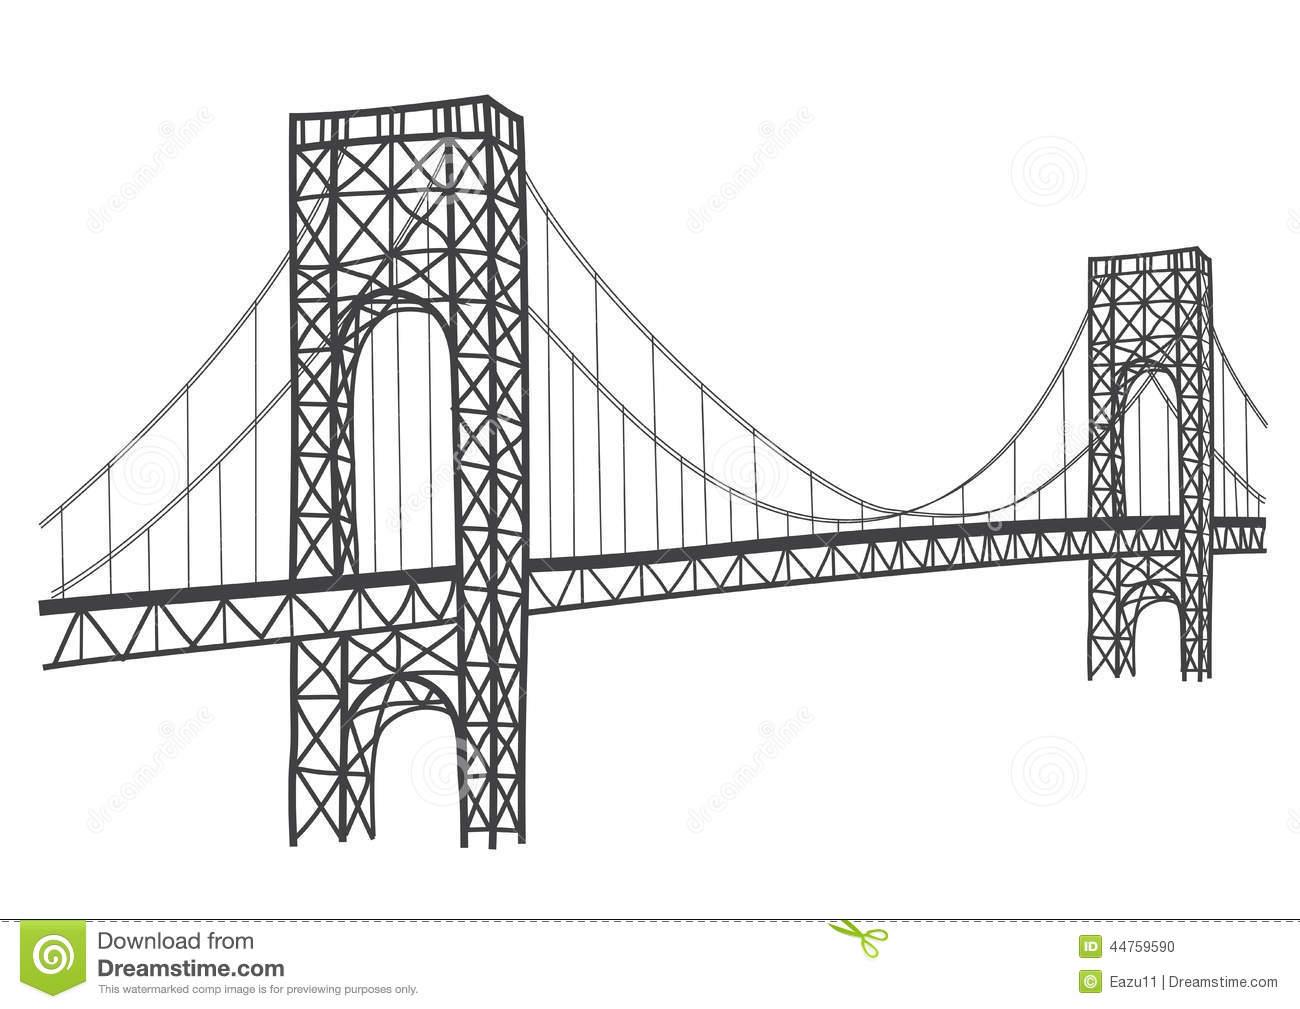 bridge clipart-bridge clipart-17